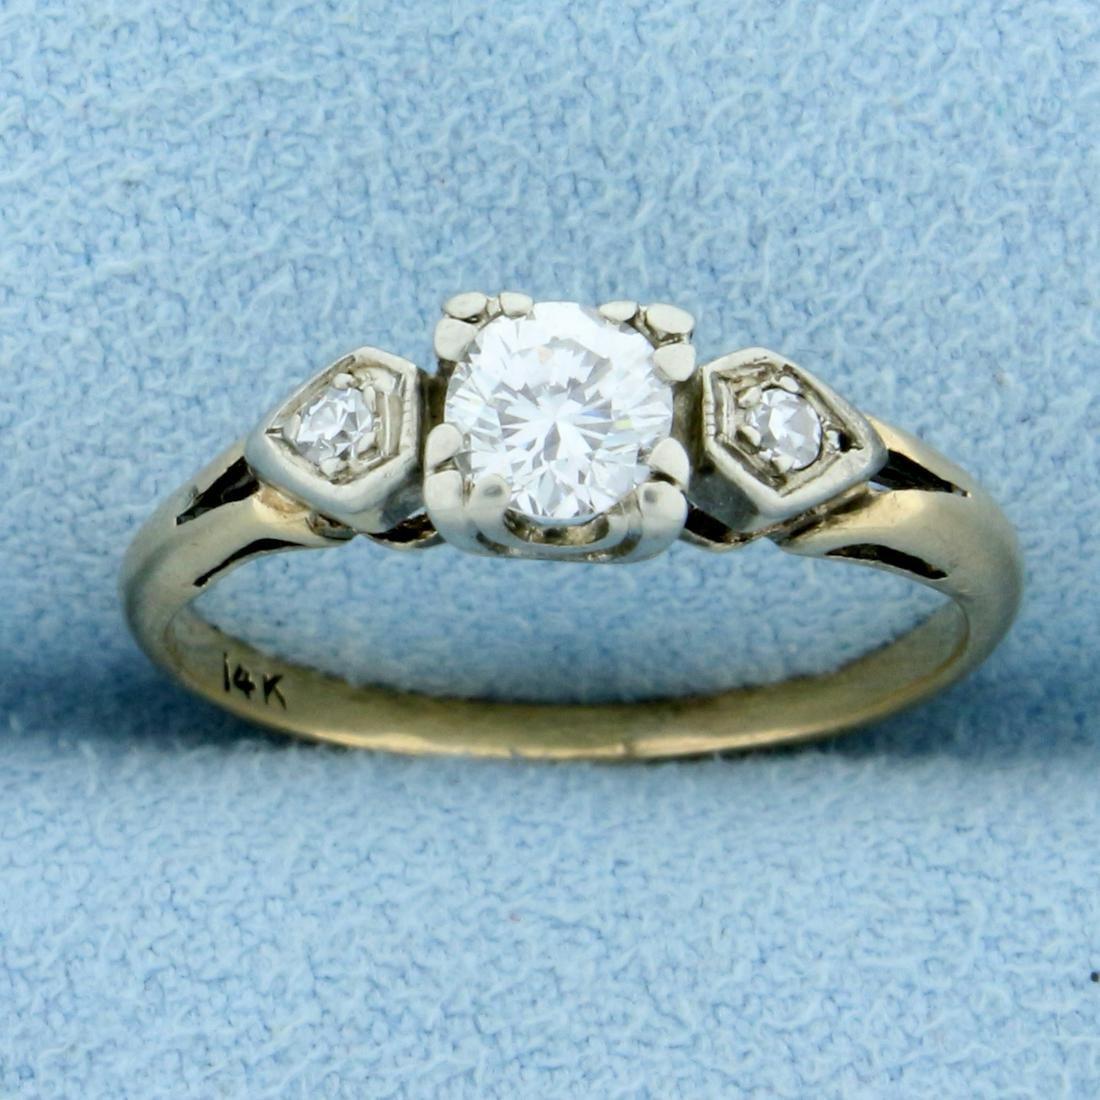 Vintage Three Stone Diamond Ring in 14K Yellow Gold